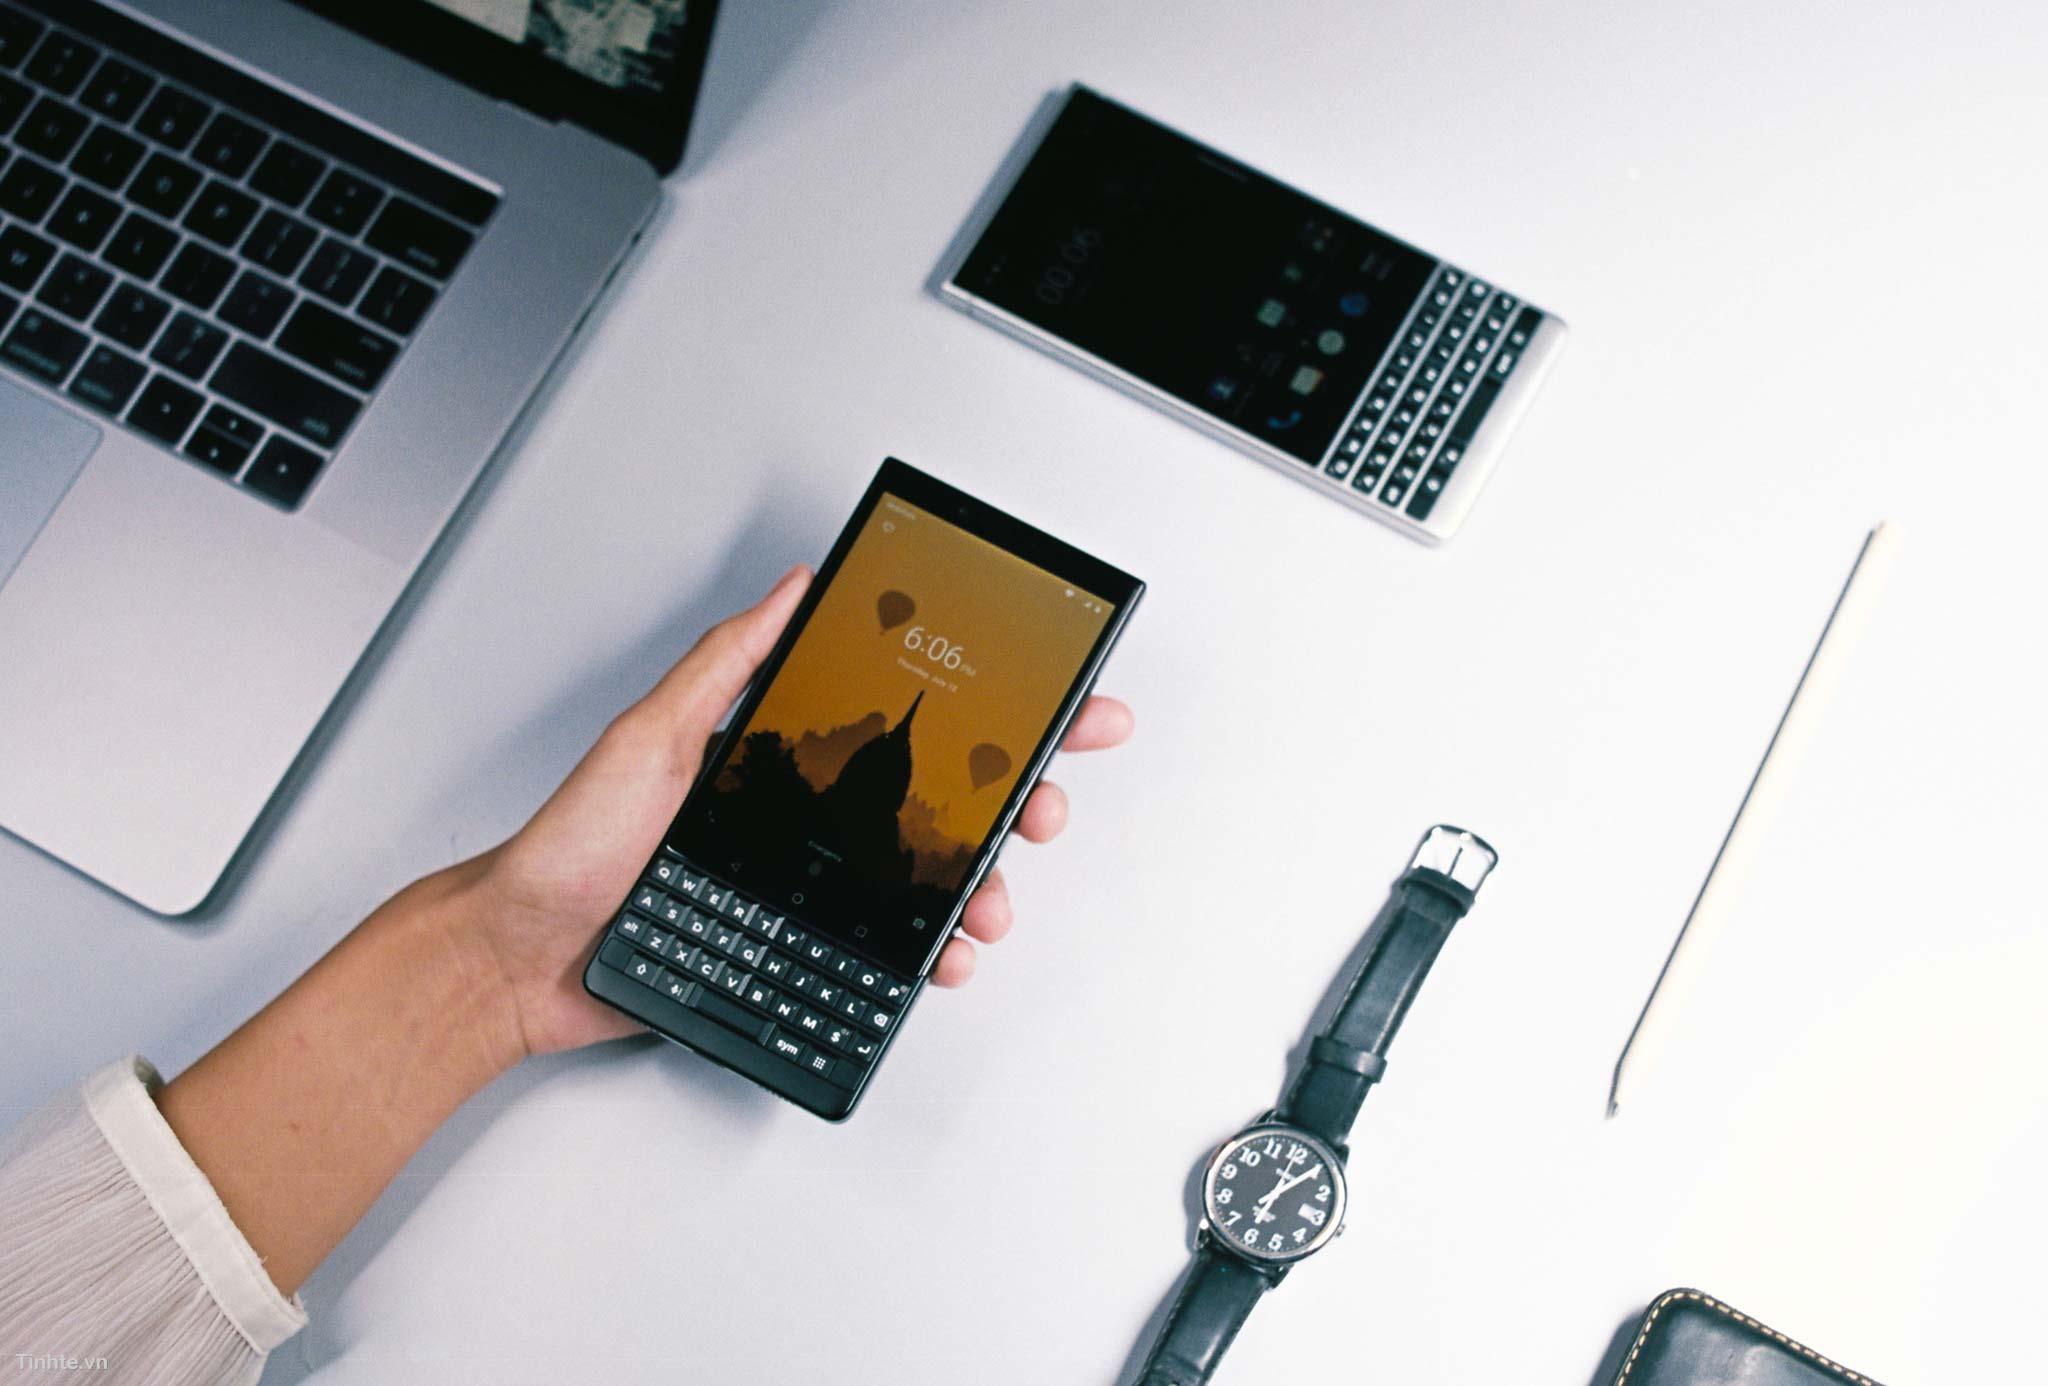 4360040_tinhte_tren_tay_blackberry_key2_22.jpg